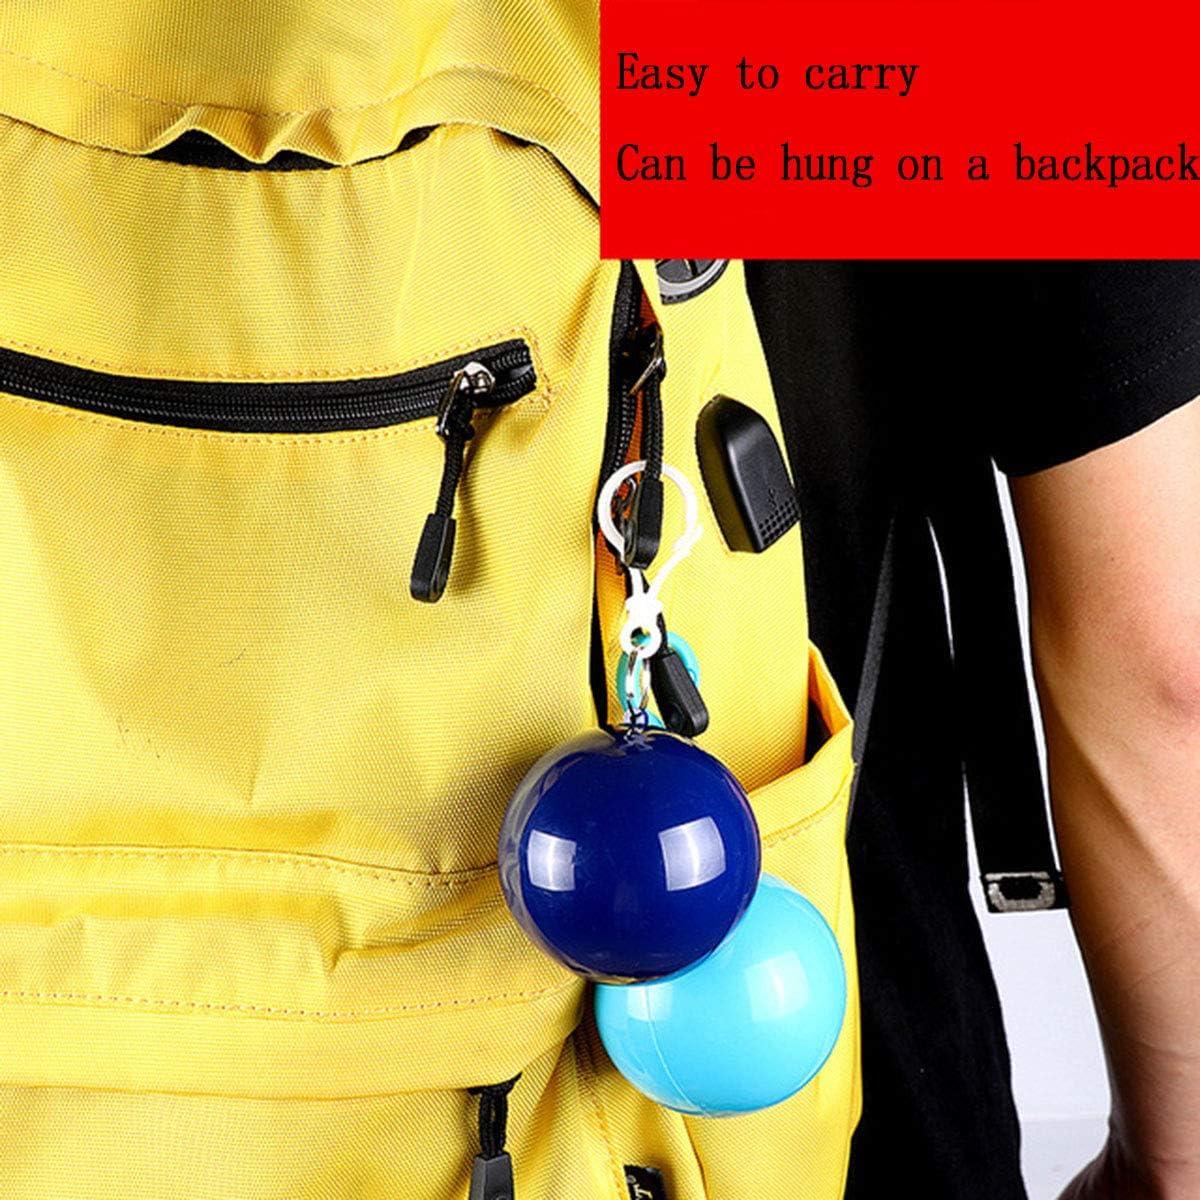 Crazestar Portable Plastic Convenient Emergency Raincoat Ball Disposable Raincoat 6 Colors-6 PCS